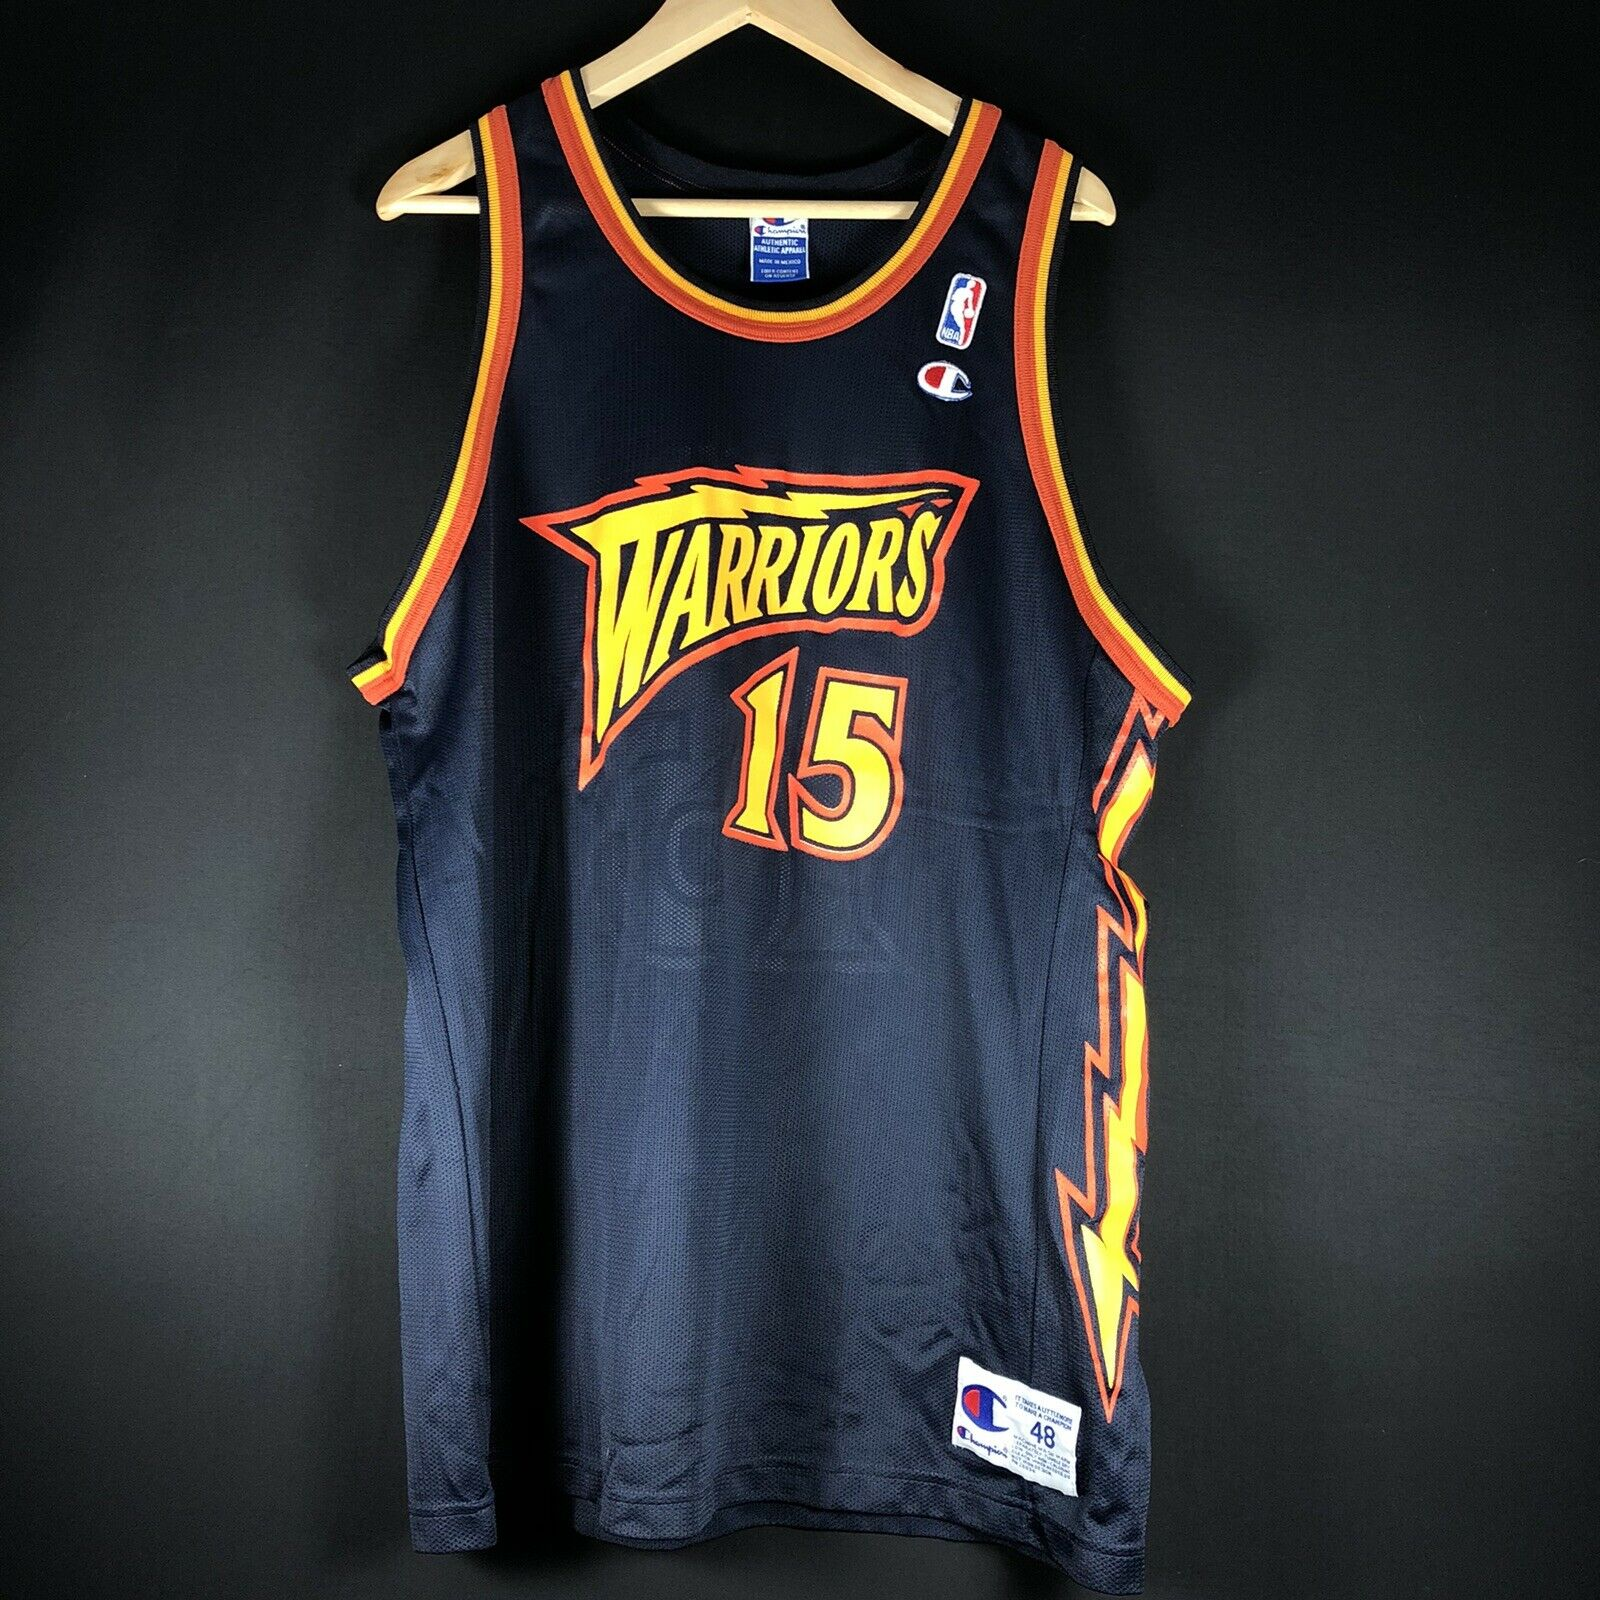 Champion USA Sprewell NBA Trikot Warriors Basketball Jersey Jordan XL 48 Bogues